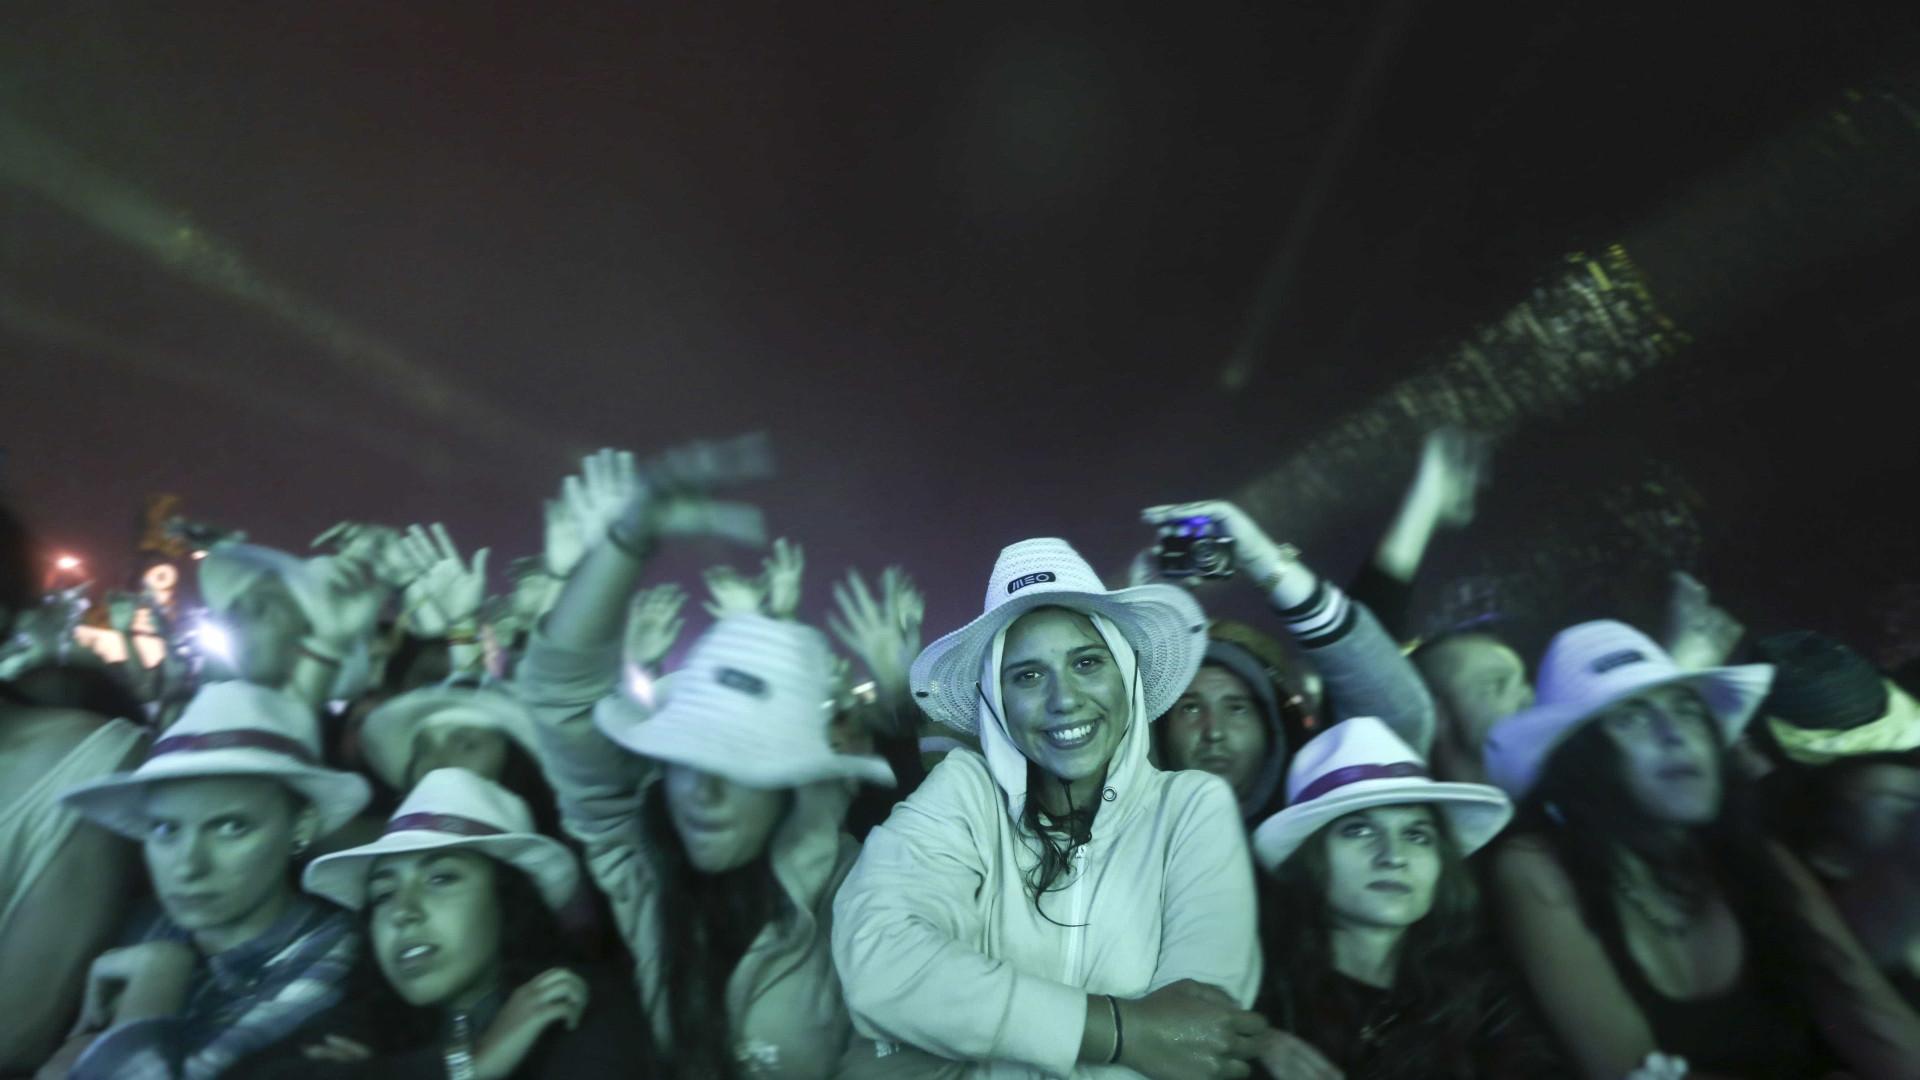 Festival arranca hoje com Bastille em destaque — Marés Vivas